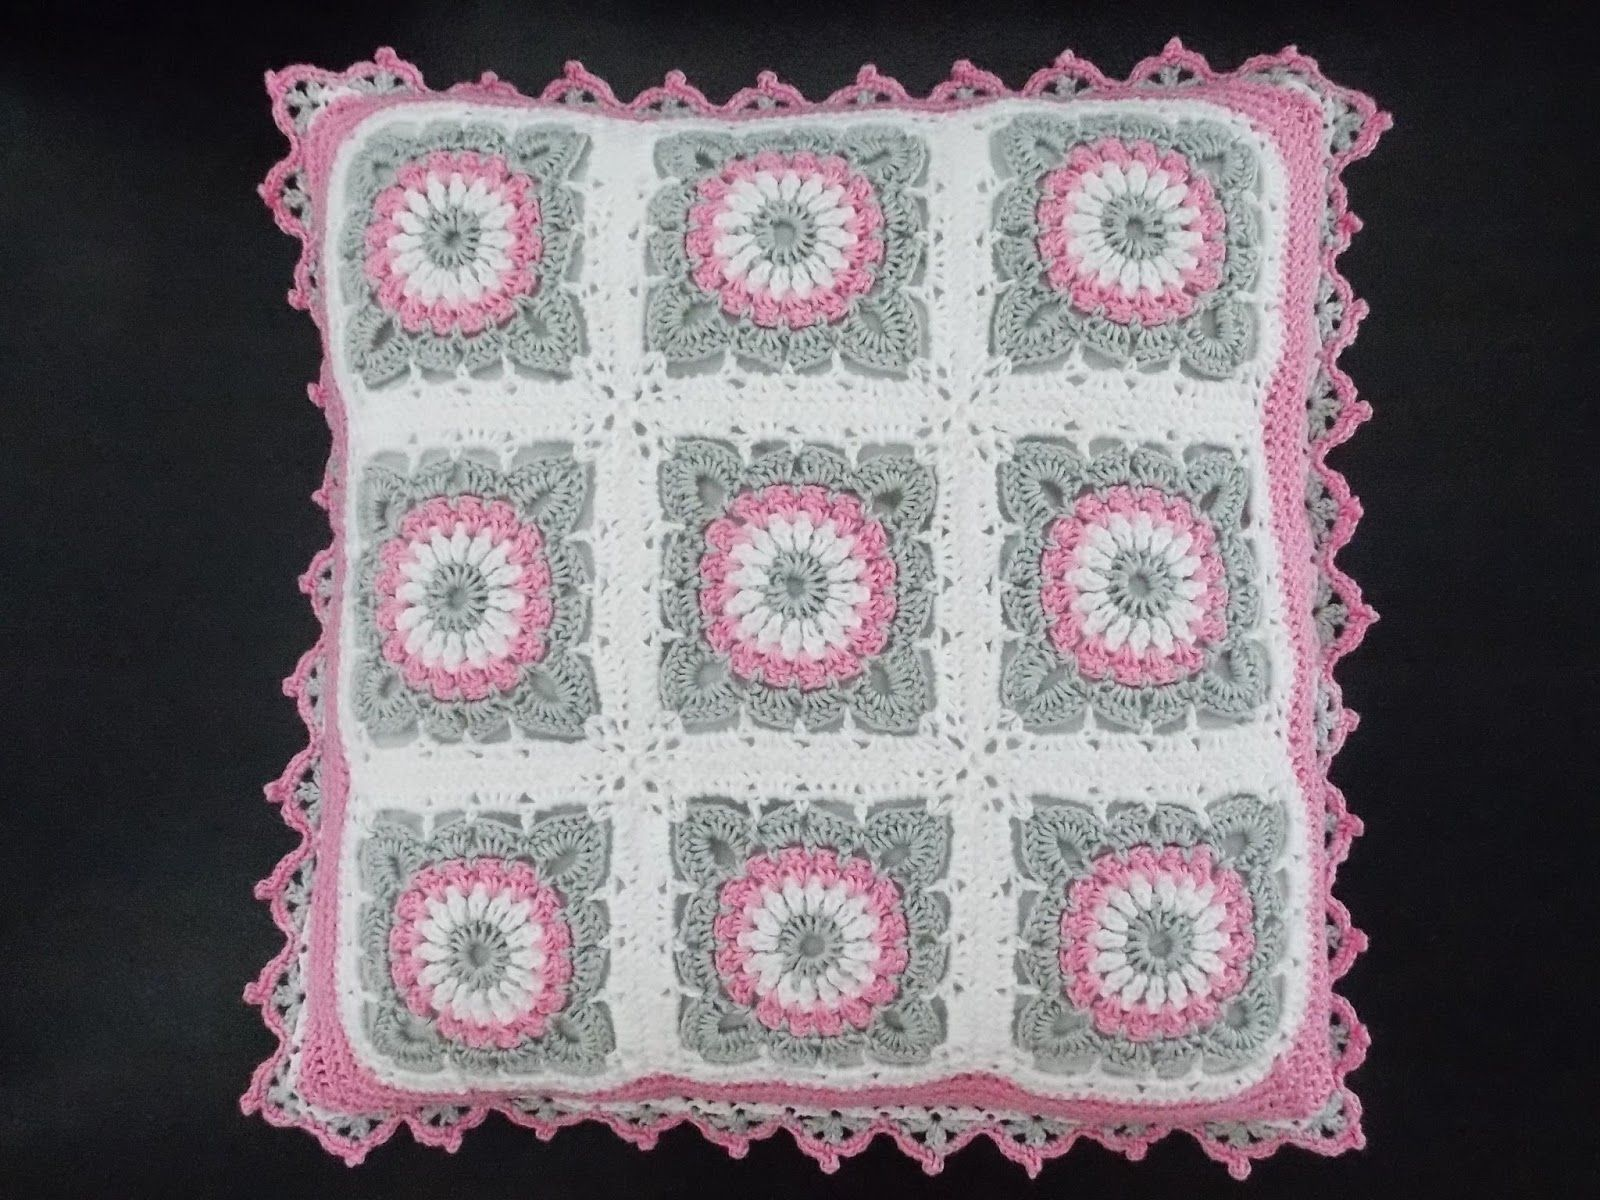 Pin de Dolores Domingues en almofadas em crochet   Pinterest